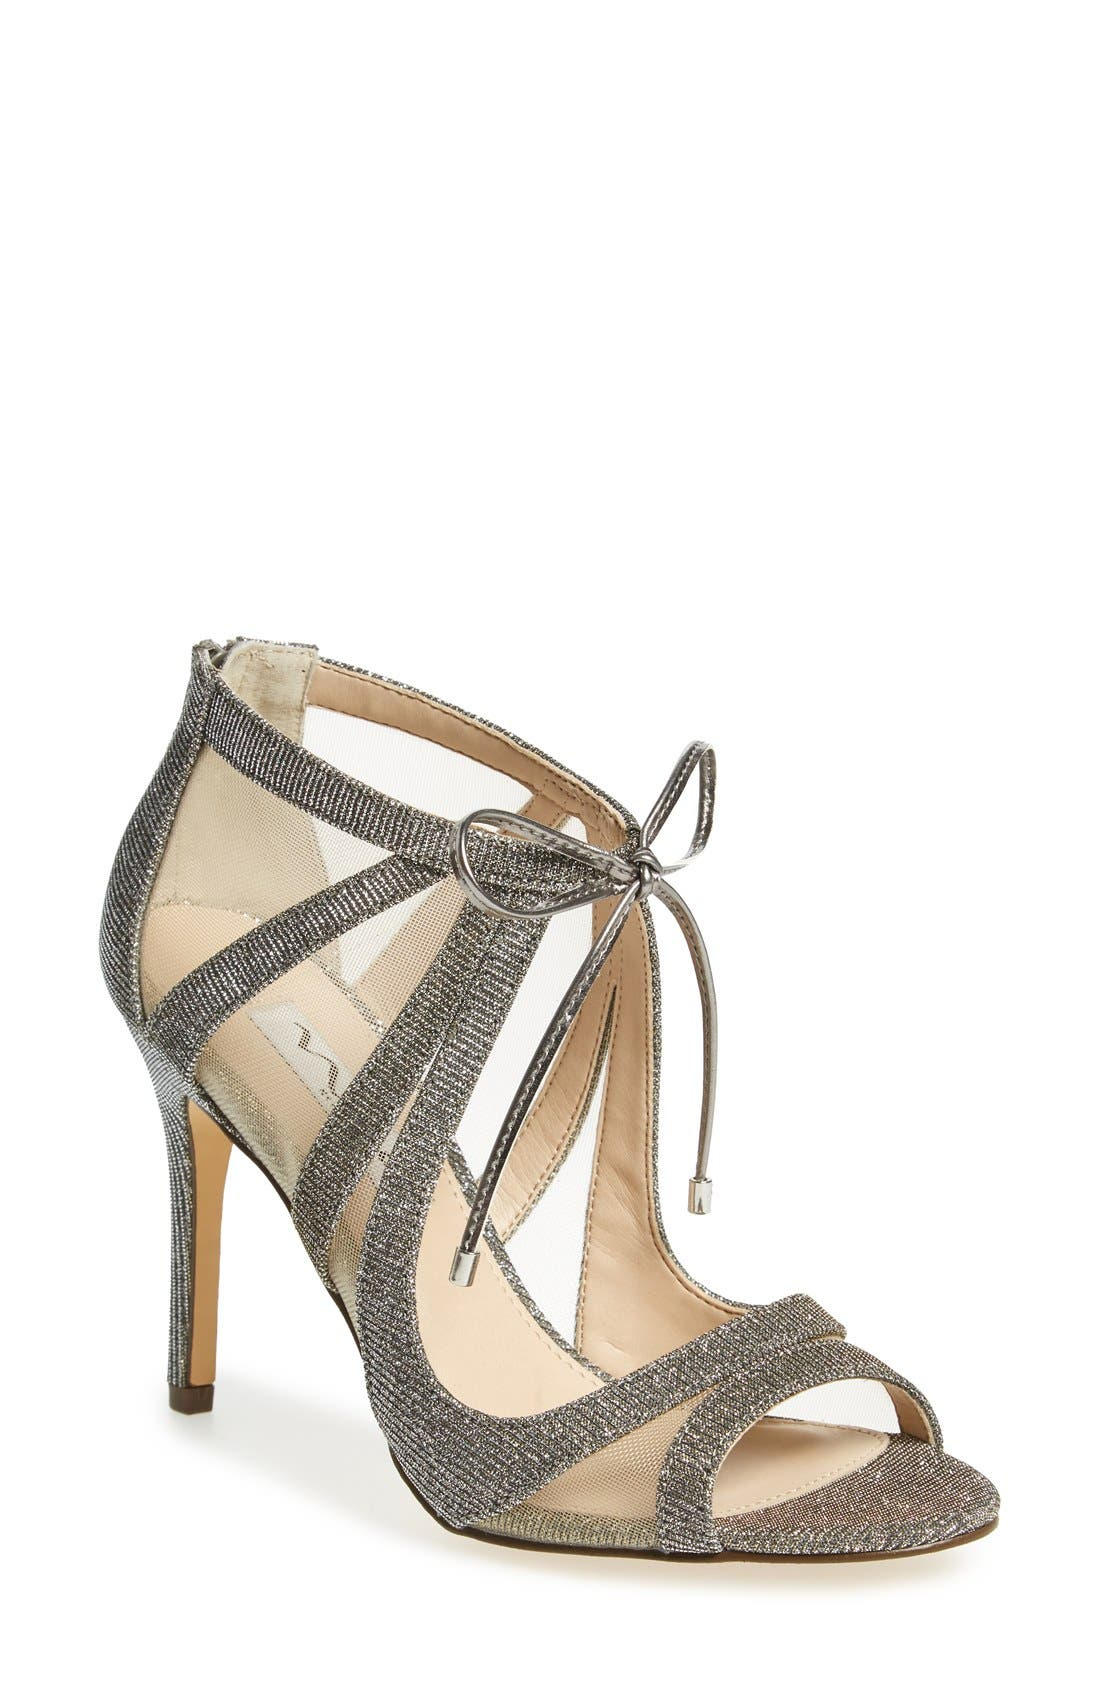 Cherie Illusion Sandal,                         Main,                         color, Steel/ Silver